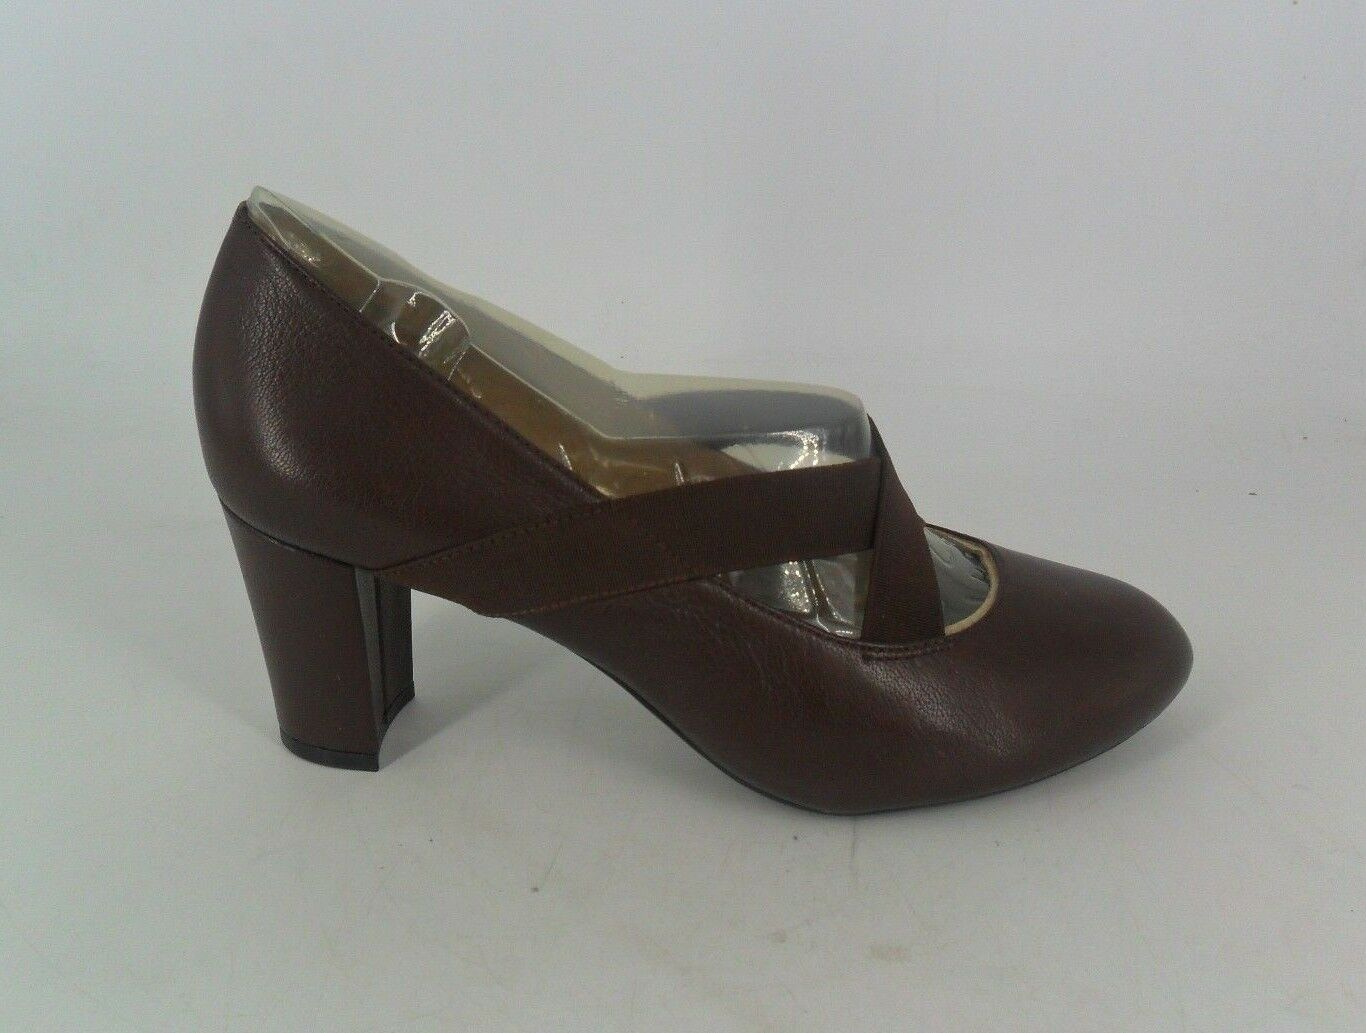 Naturalizer marron Elastic Cross Strap Court chaussures UK 5 EU 37 JS088 EE 01